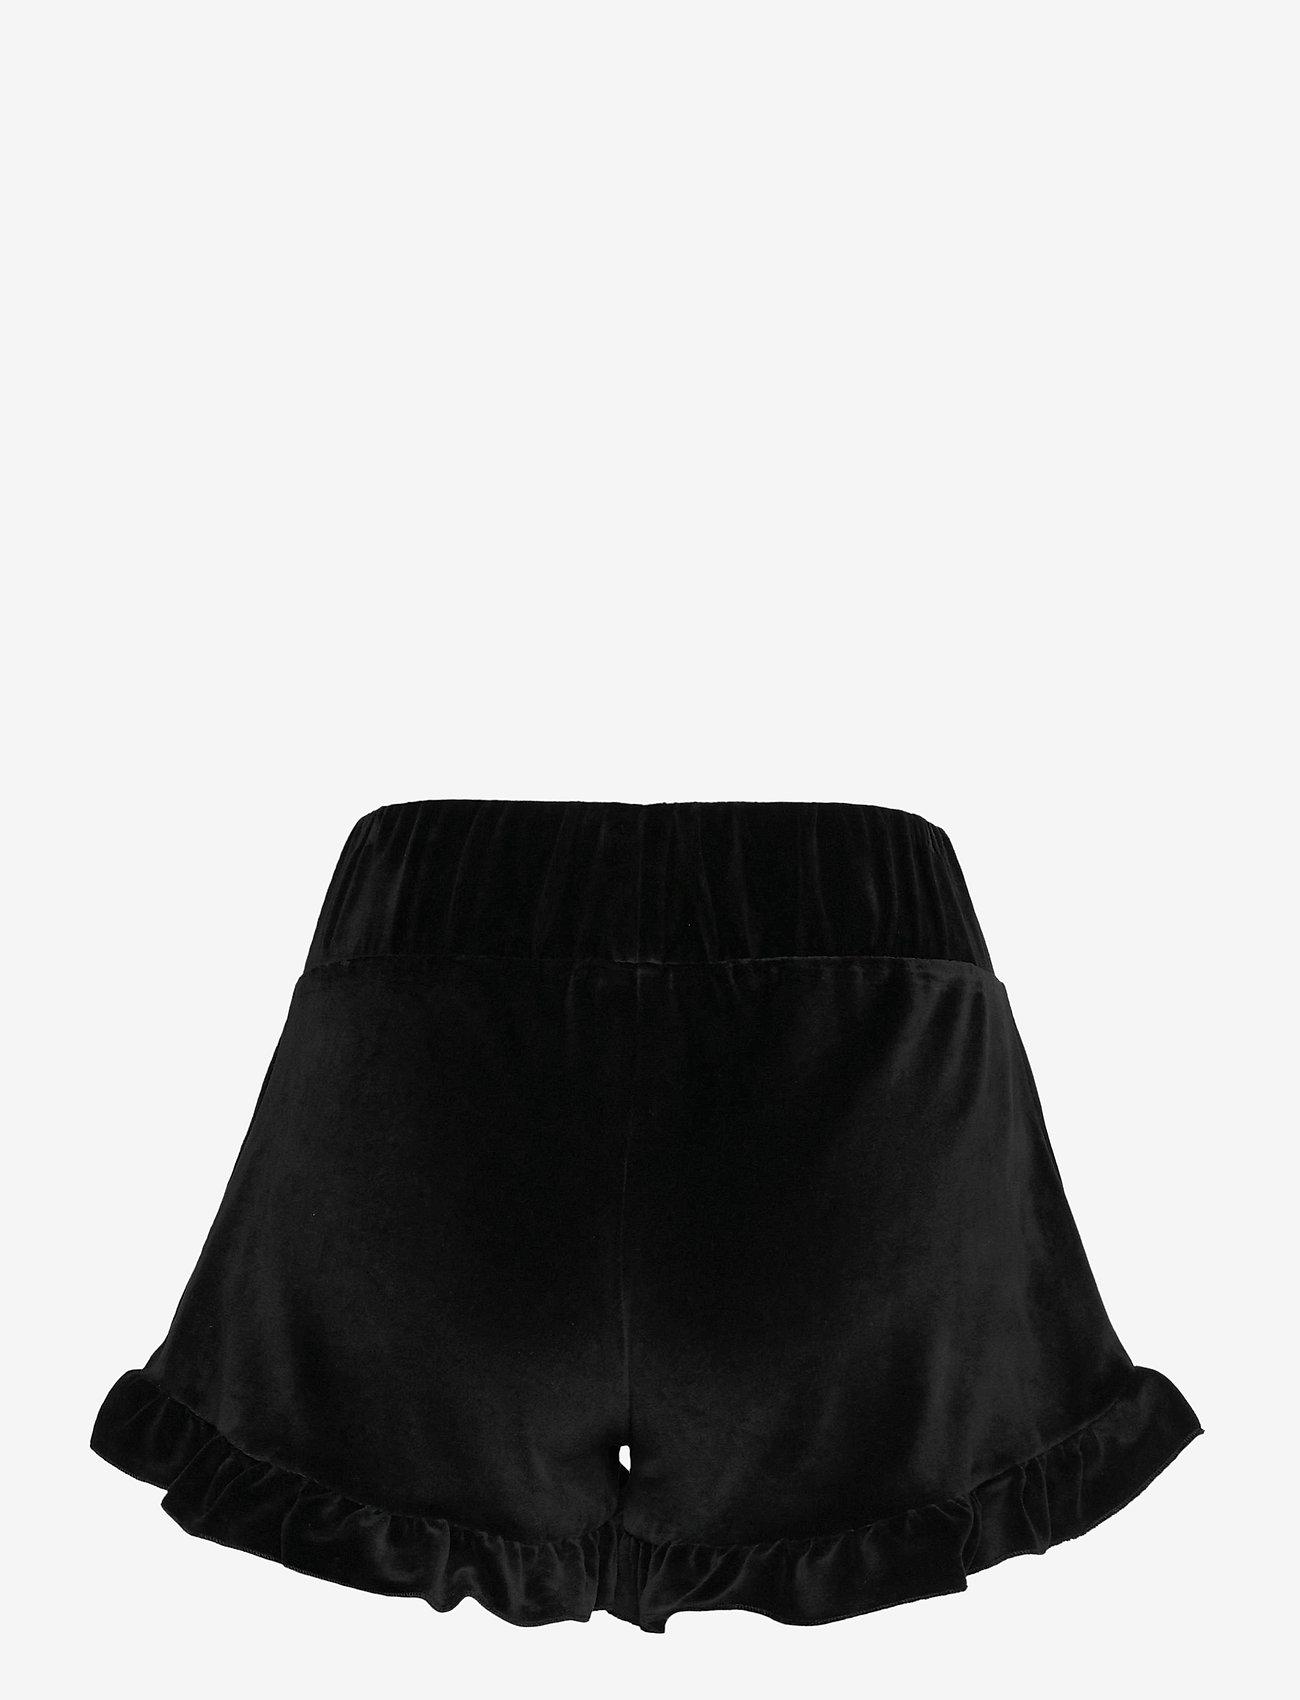 ella&il - Hay velour shorts - shorts casual - black - 1